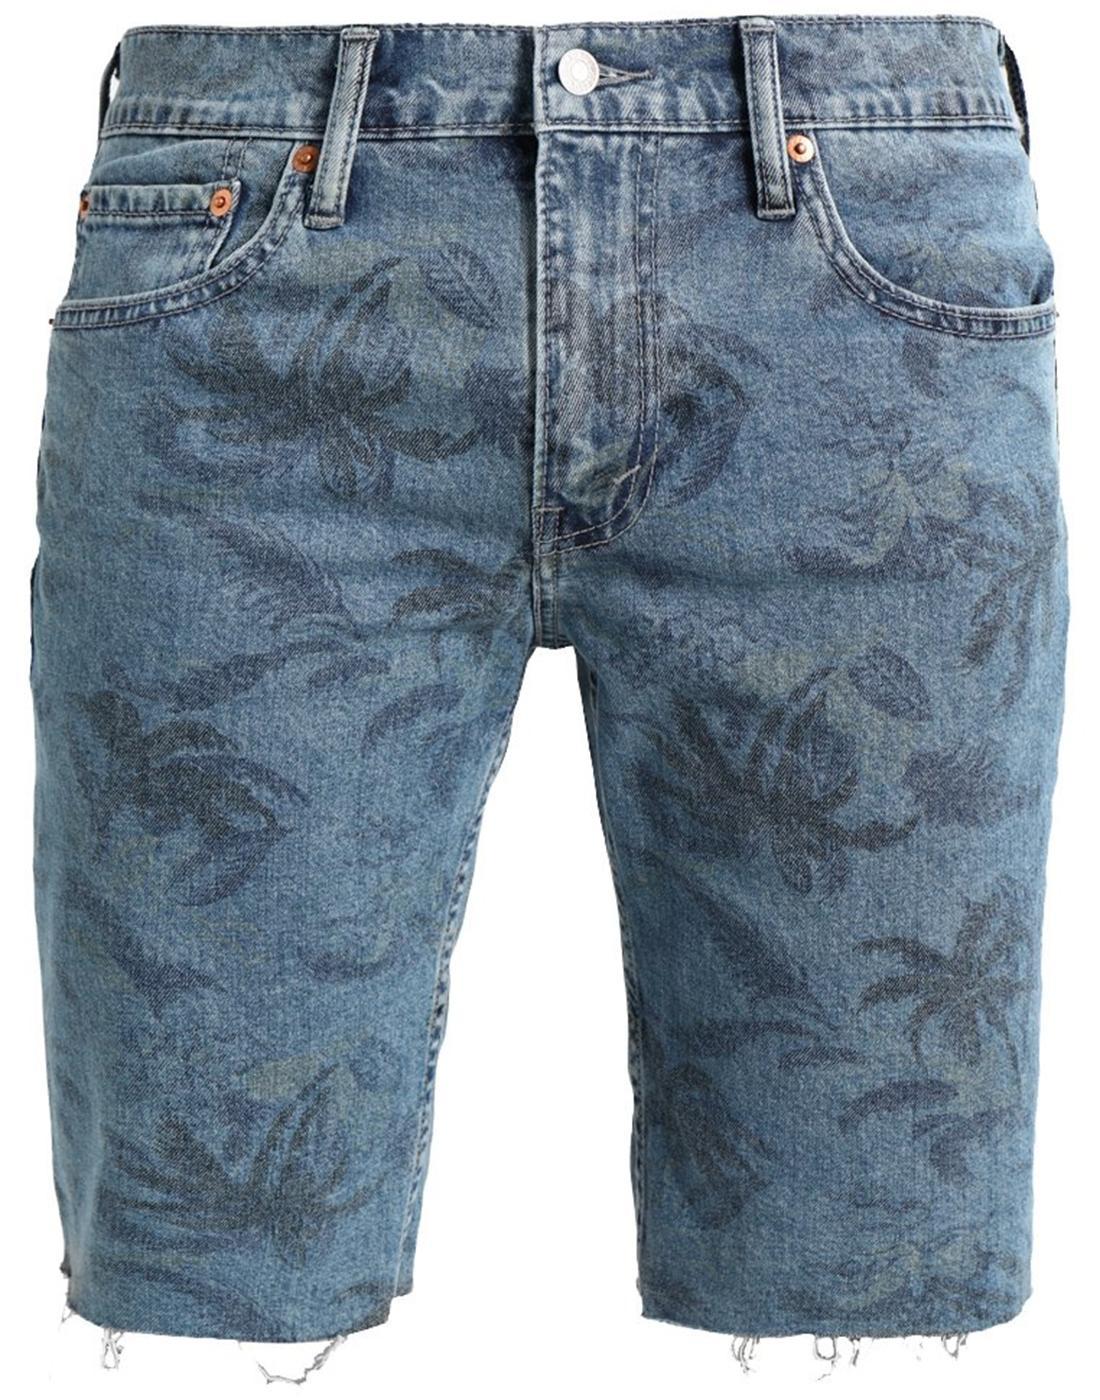 LEVI'S® 511 Slim Cut Off Denim Shorts DREAMING